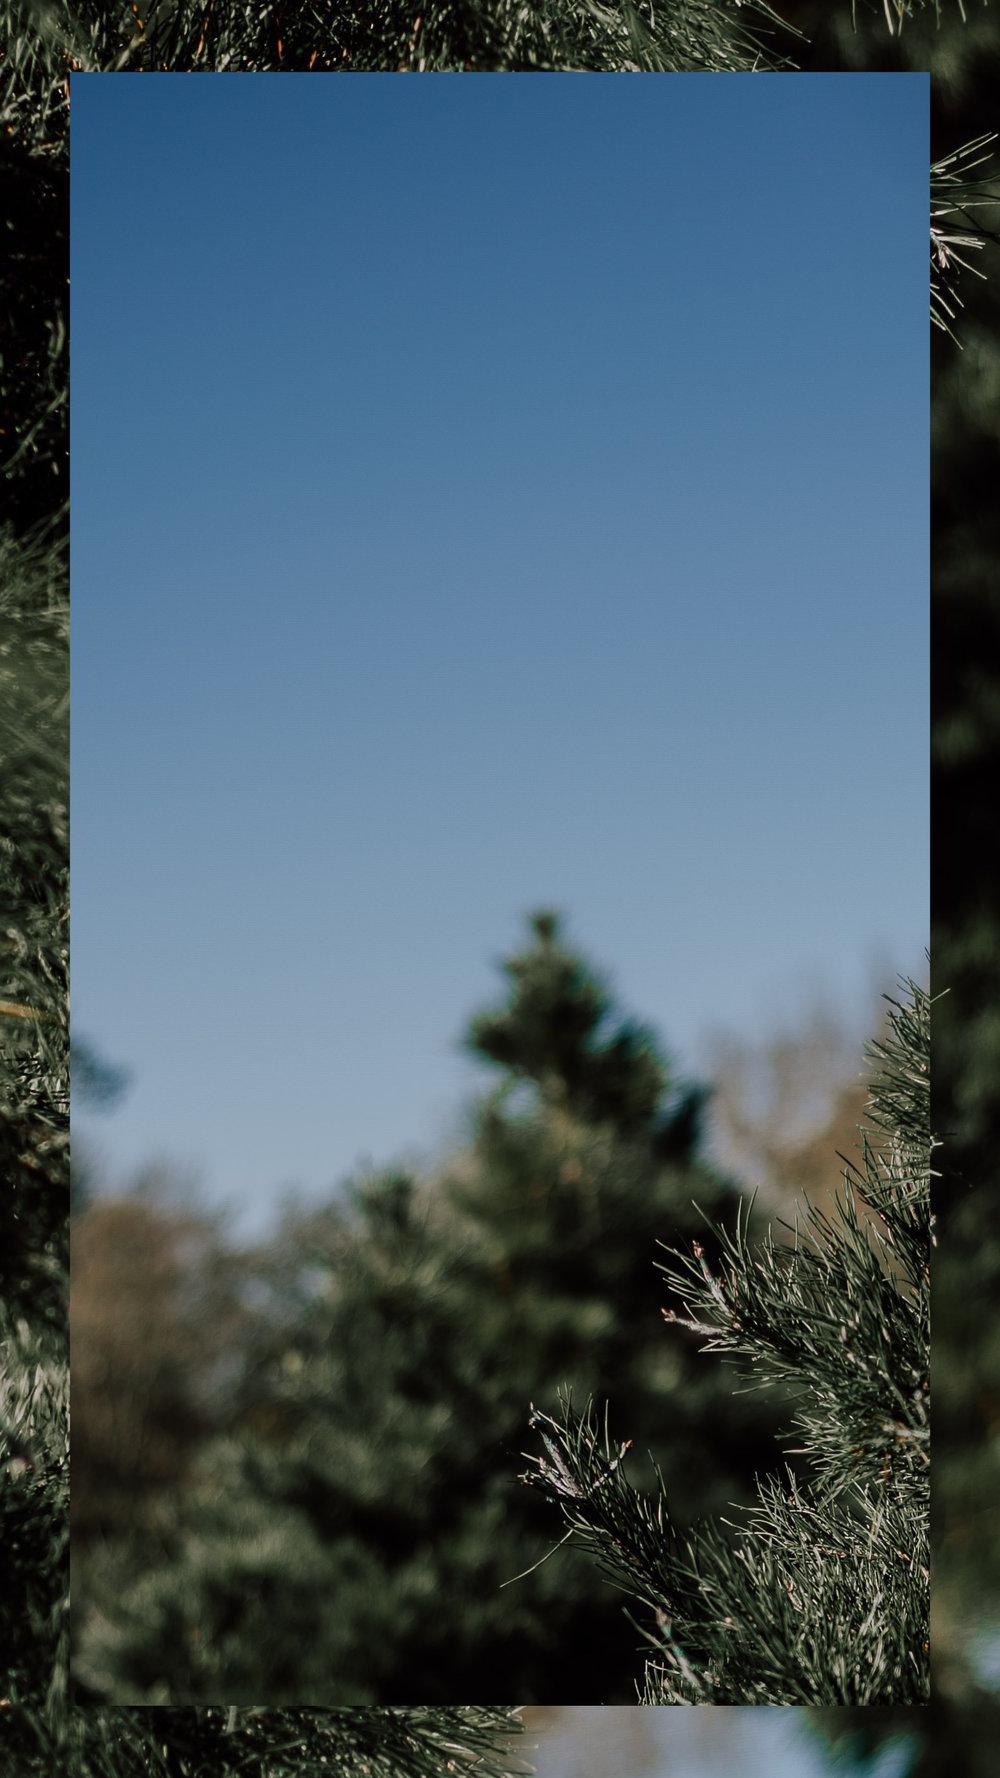 Insta-story-backgrounds3.jpg